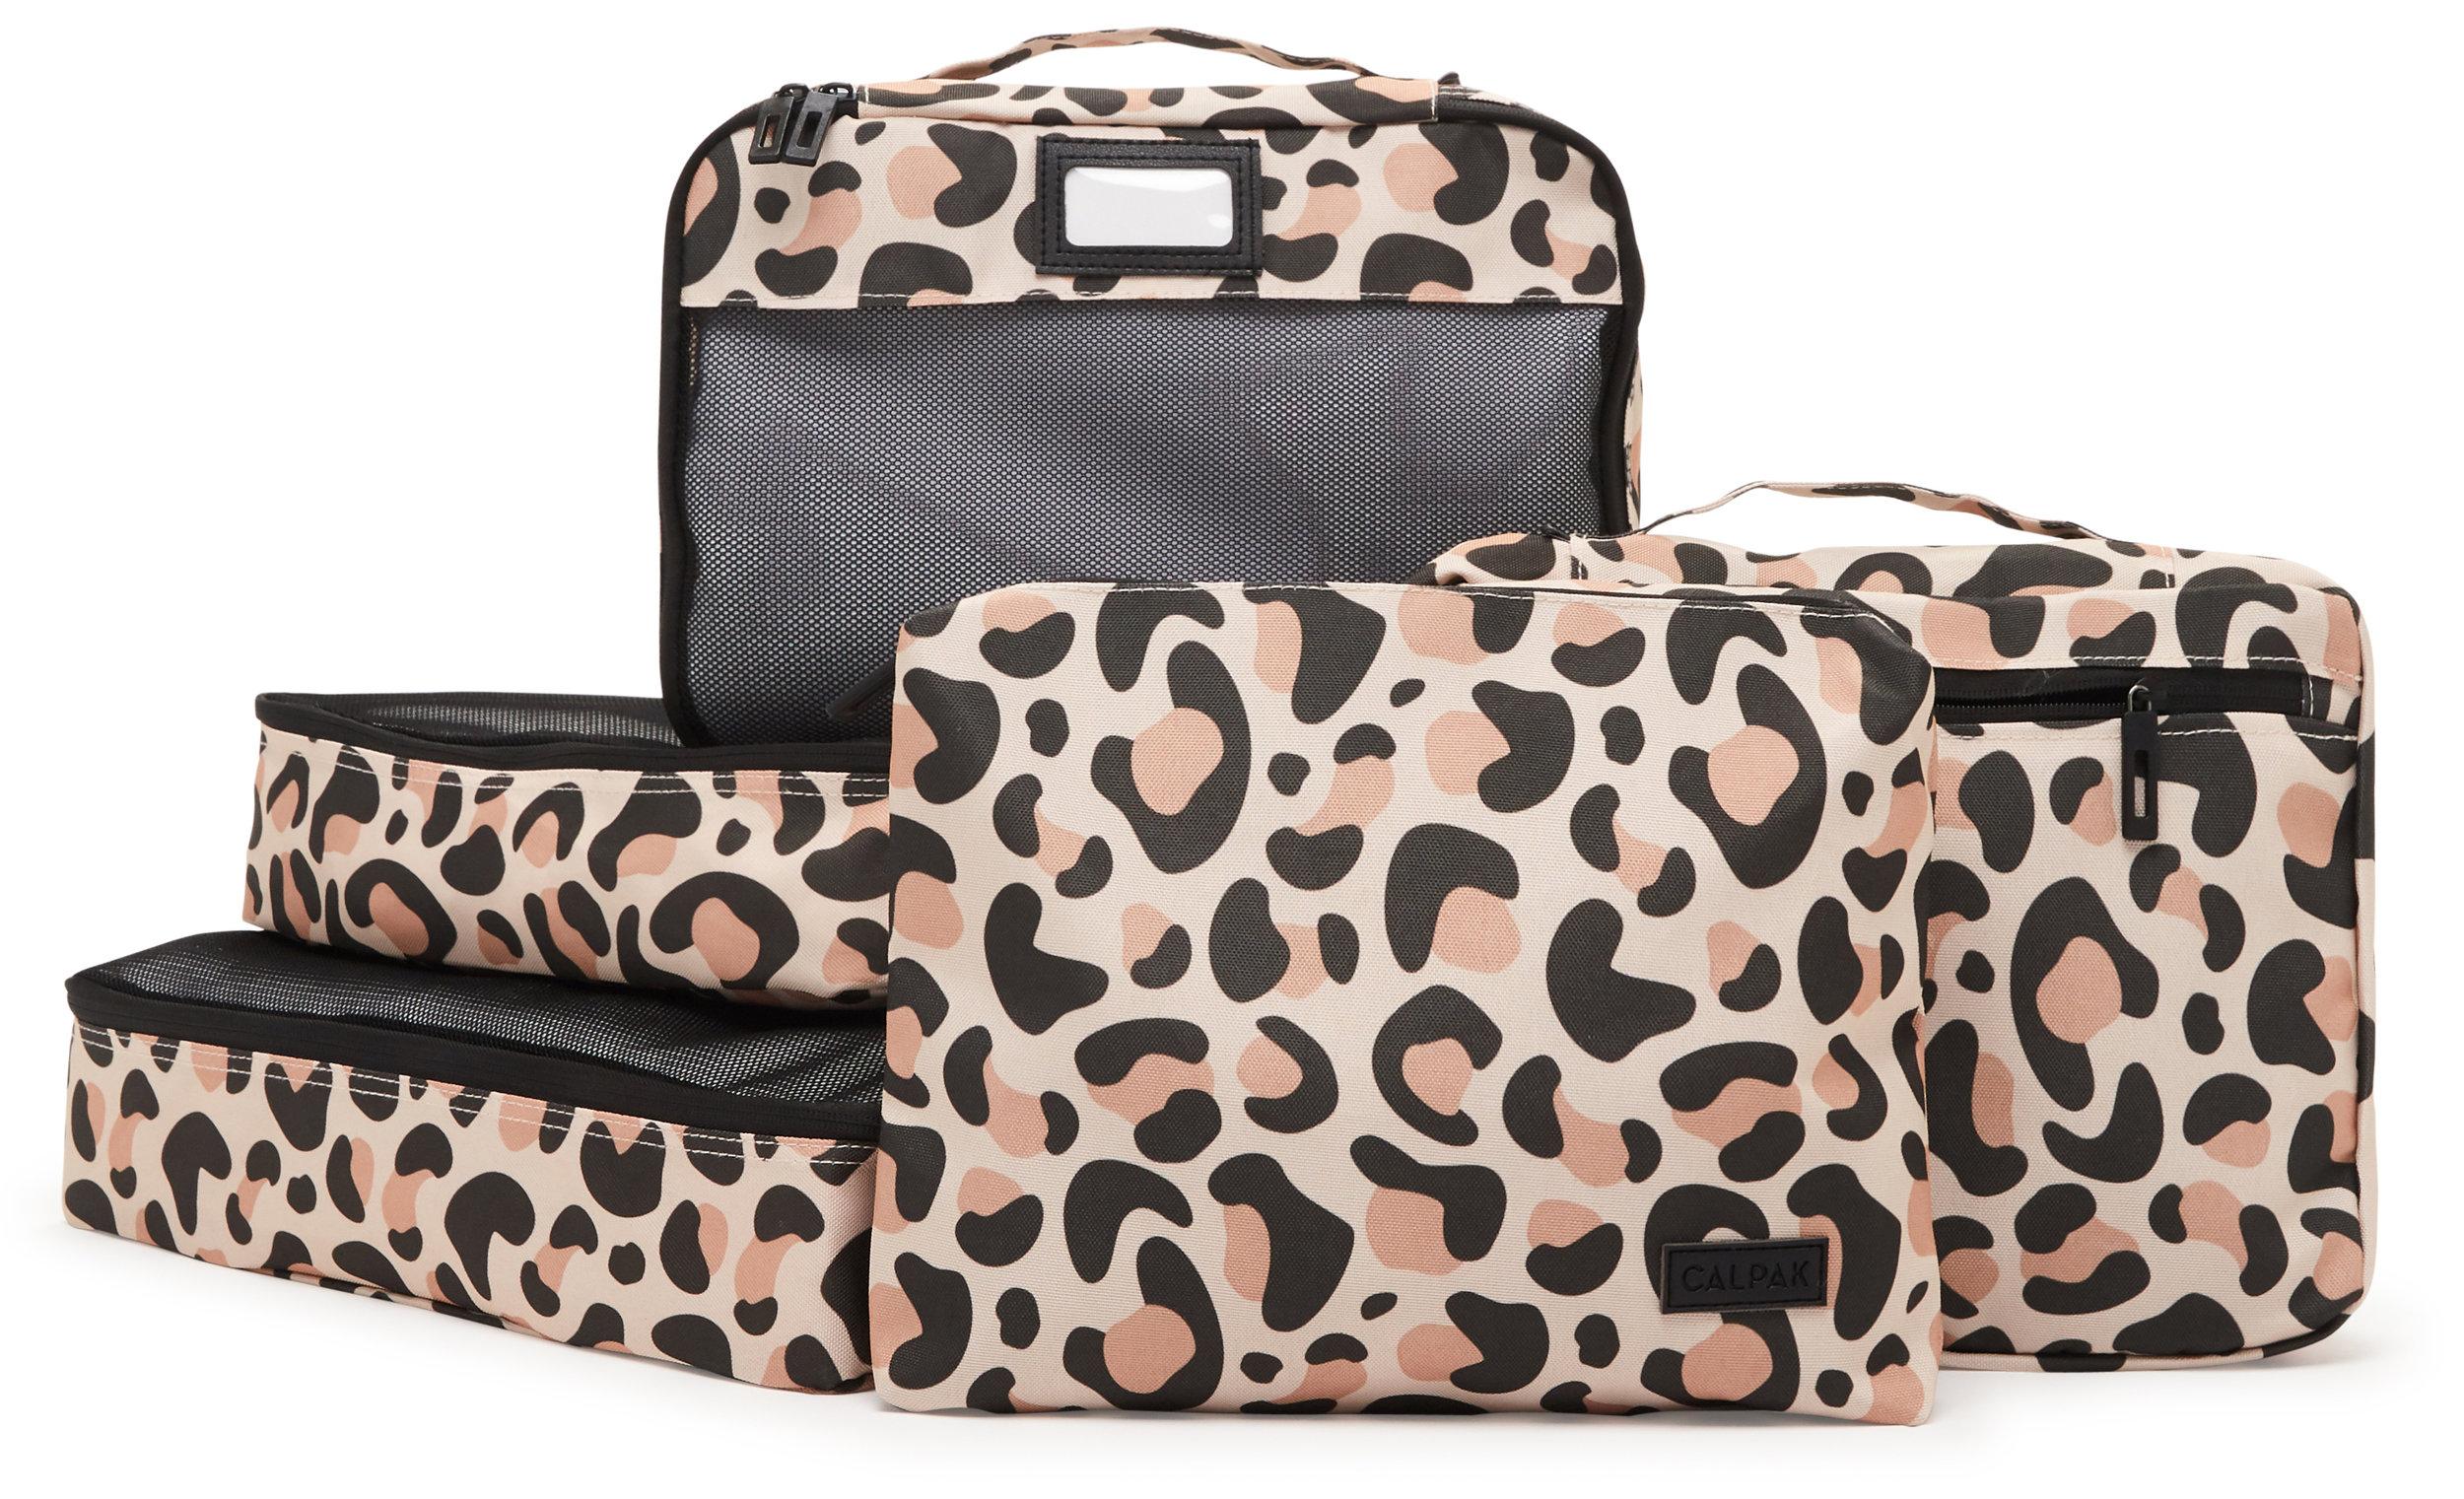 Packing Cubes - Leopard - 5-Piece Set -